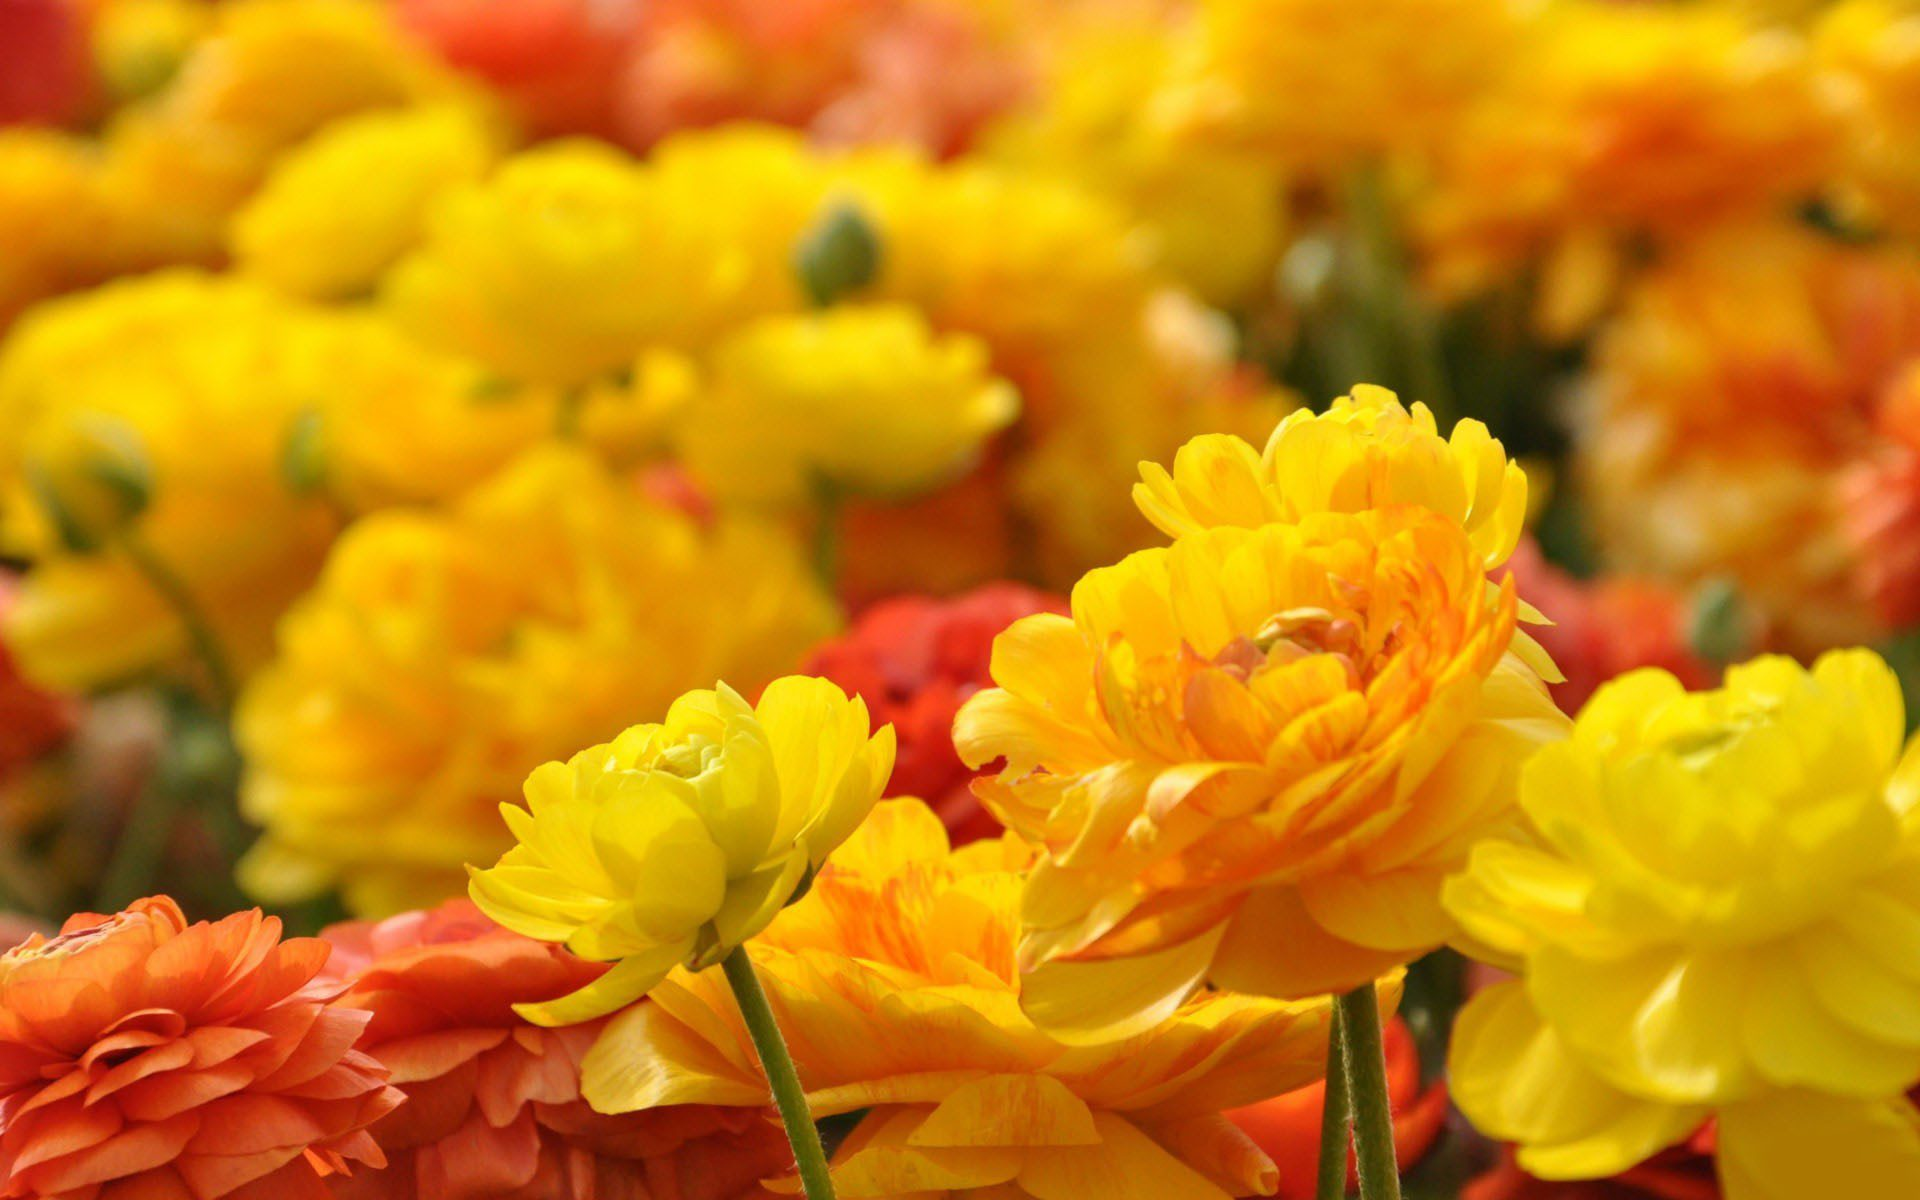 35 - Rose flower images full size hd ...